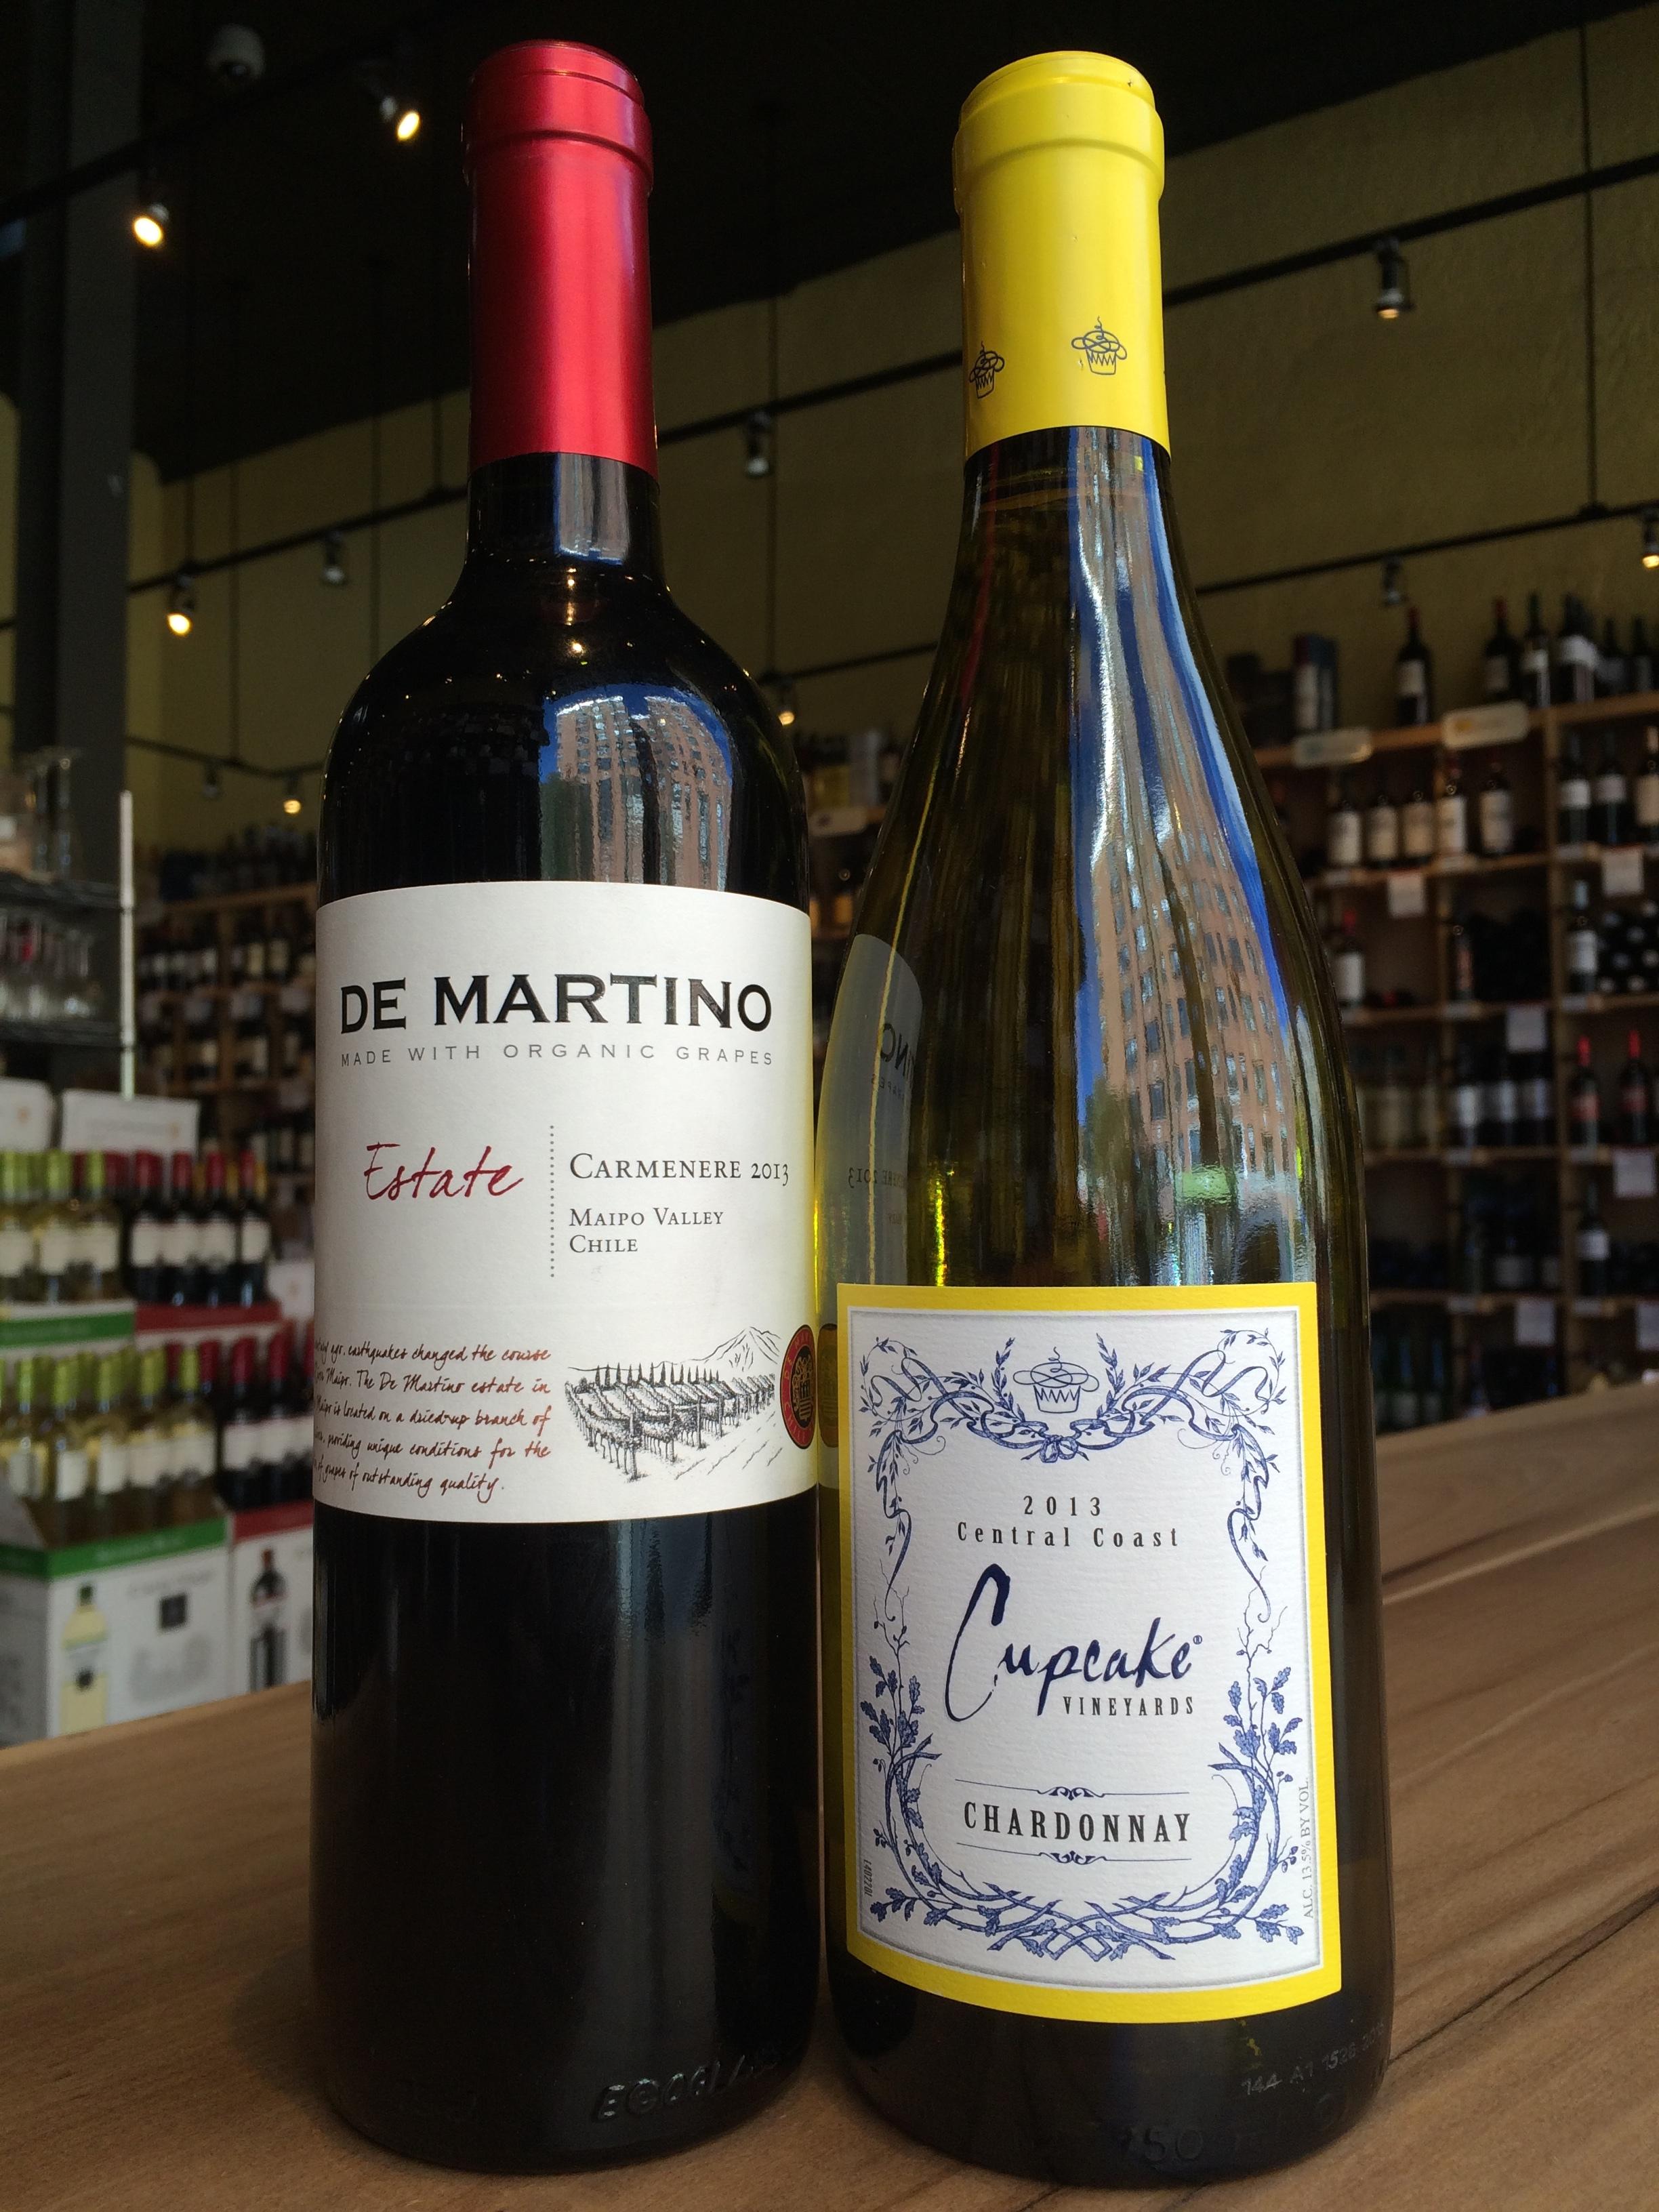 2013 De Martino Carmenere and 2013 Cupcake Chardonnay